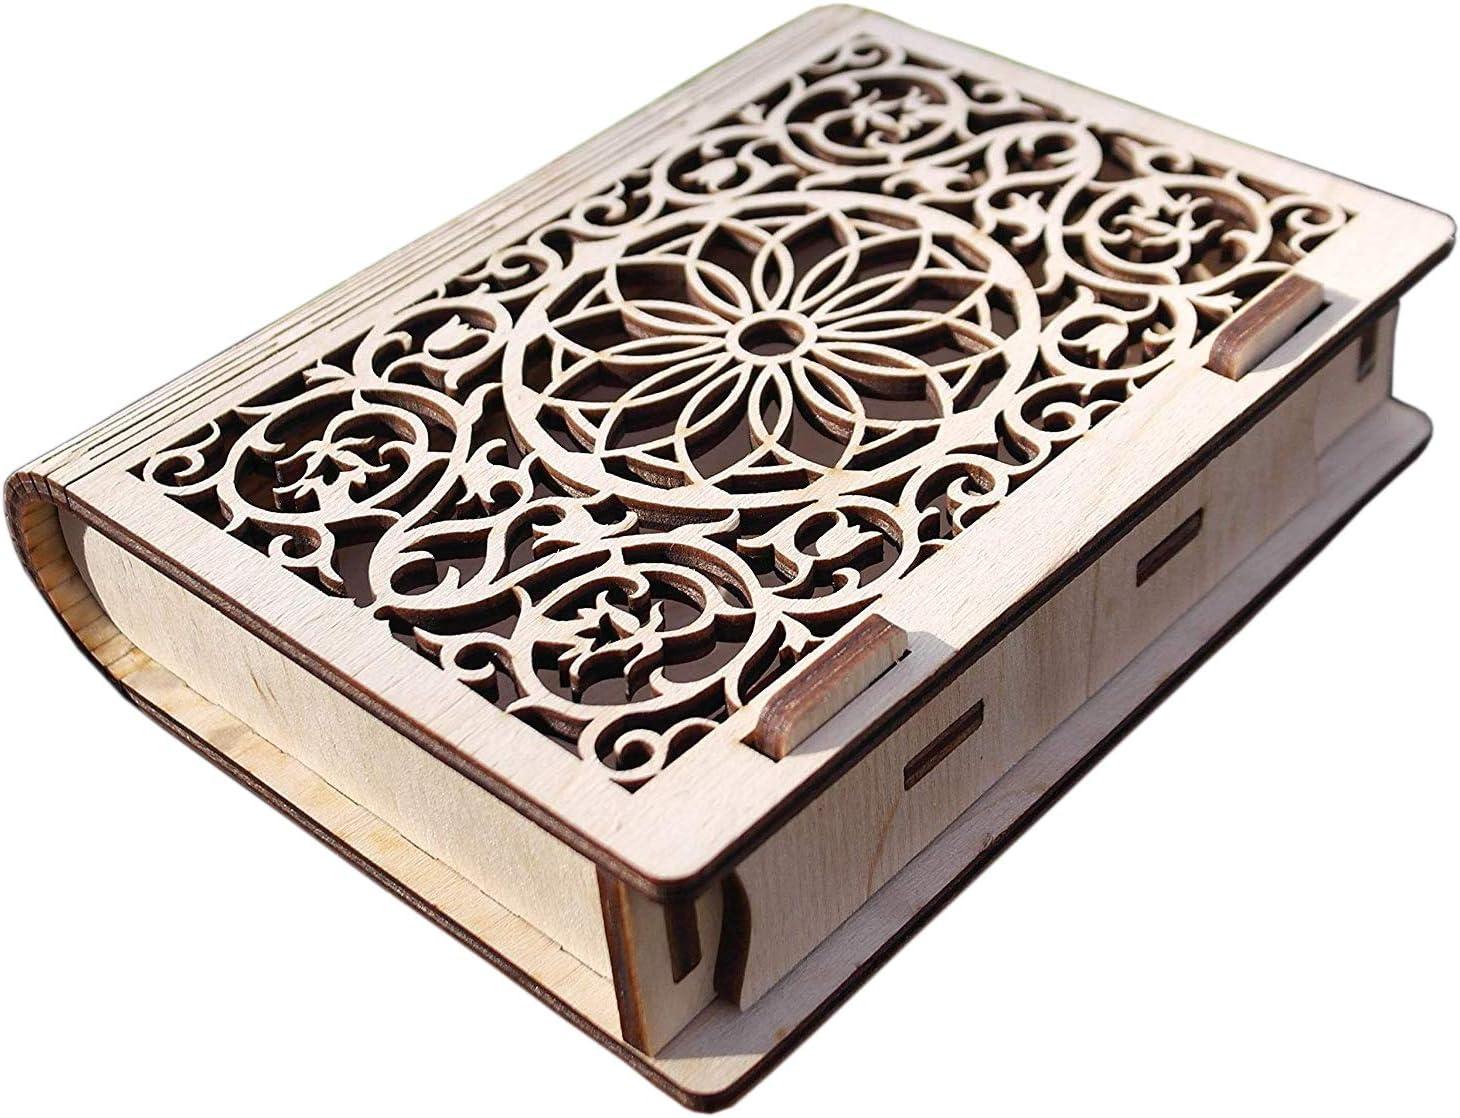 Wooden Jewelry Book Box